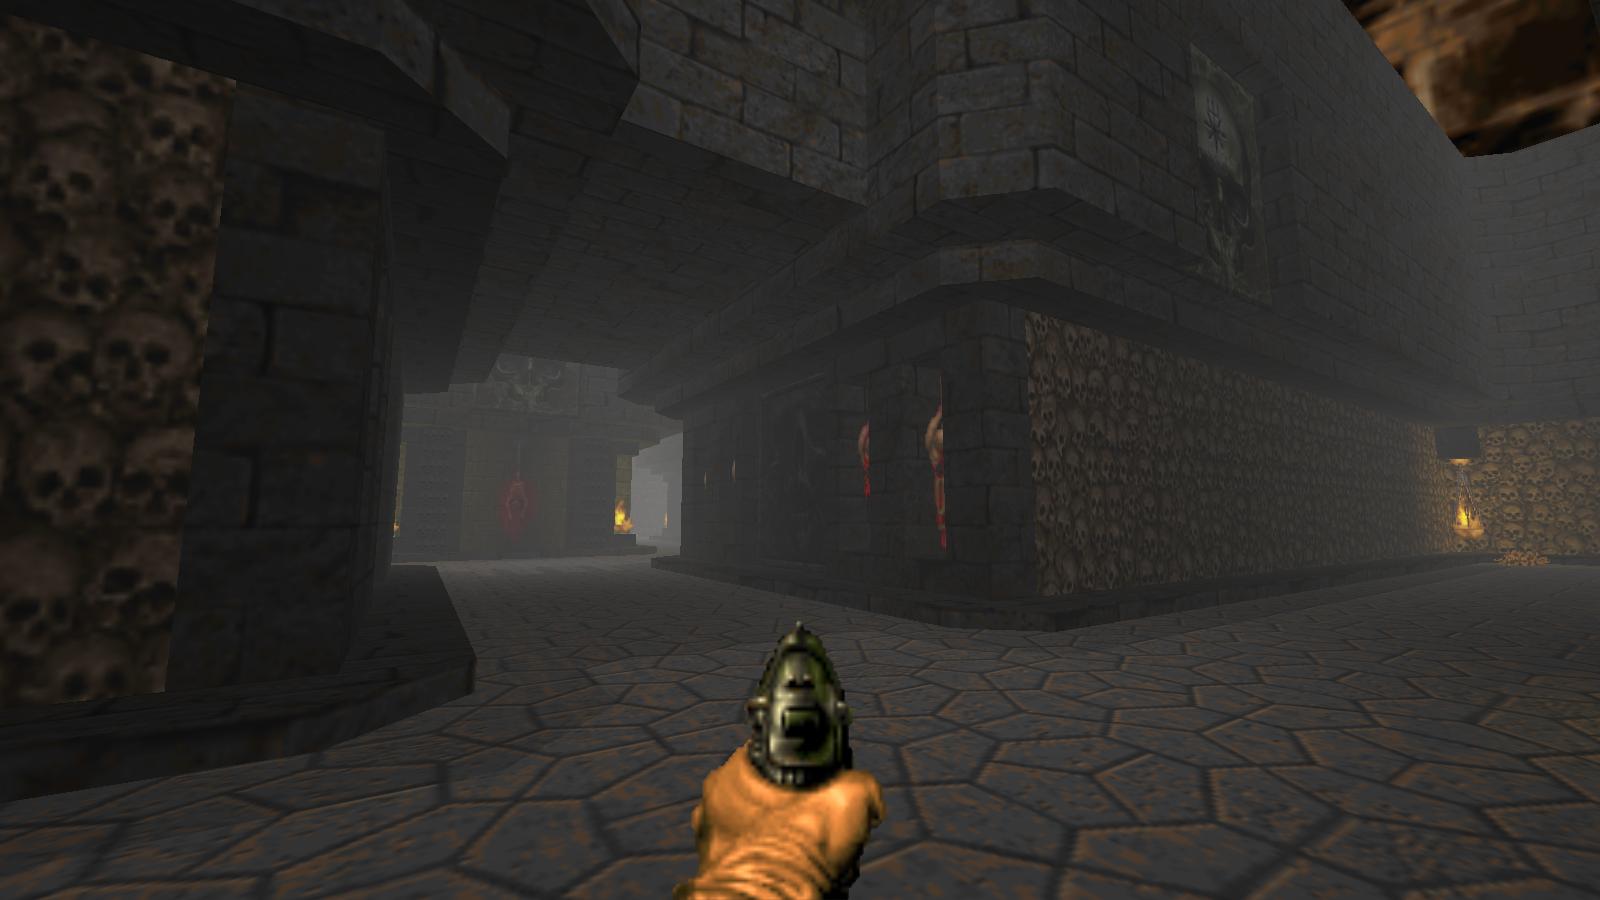 Screenshot_Doom_20201230_204930.png.505922a0f7535b13305231c2fddd8d46.png